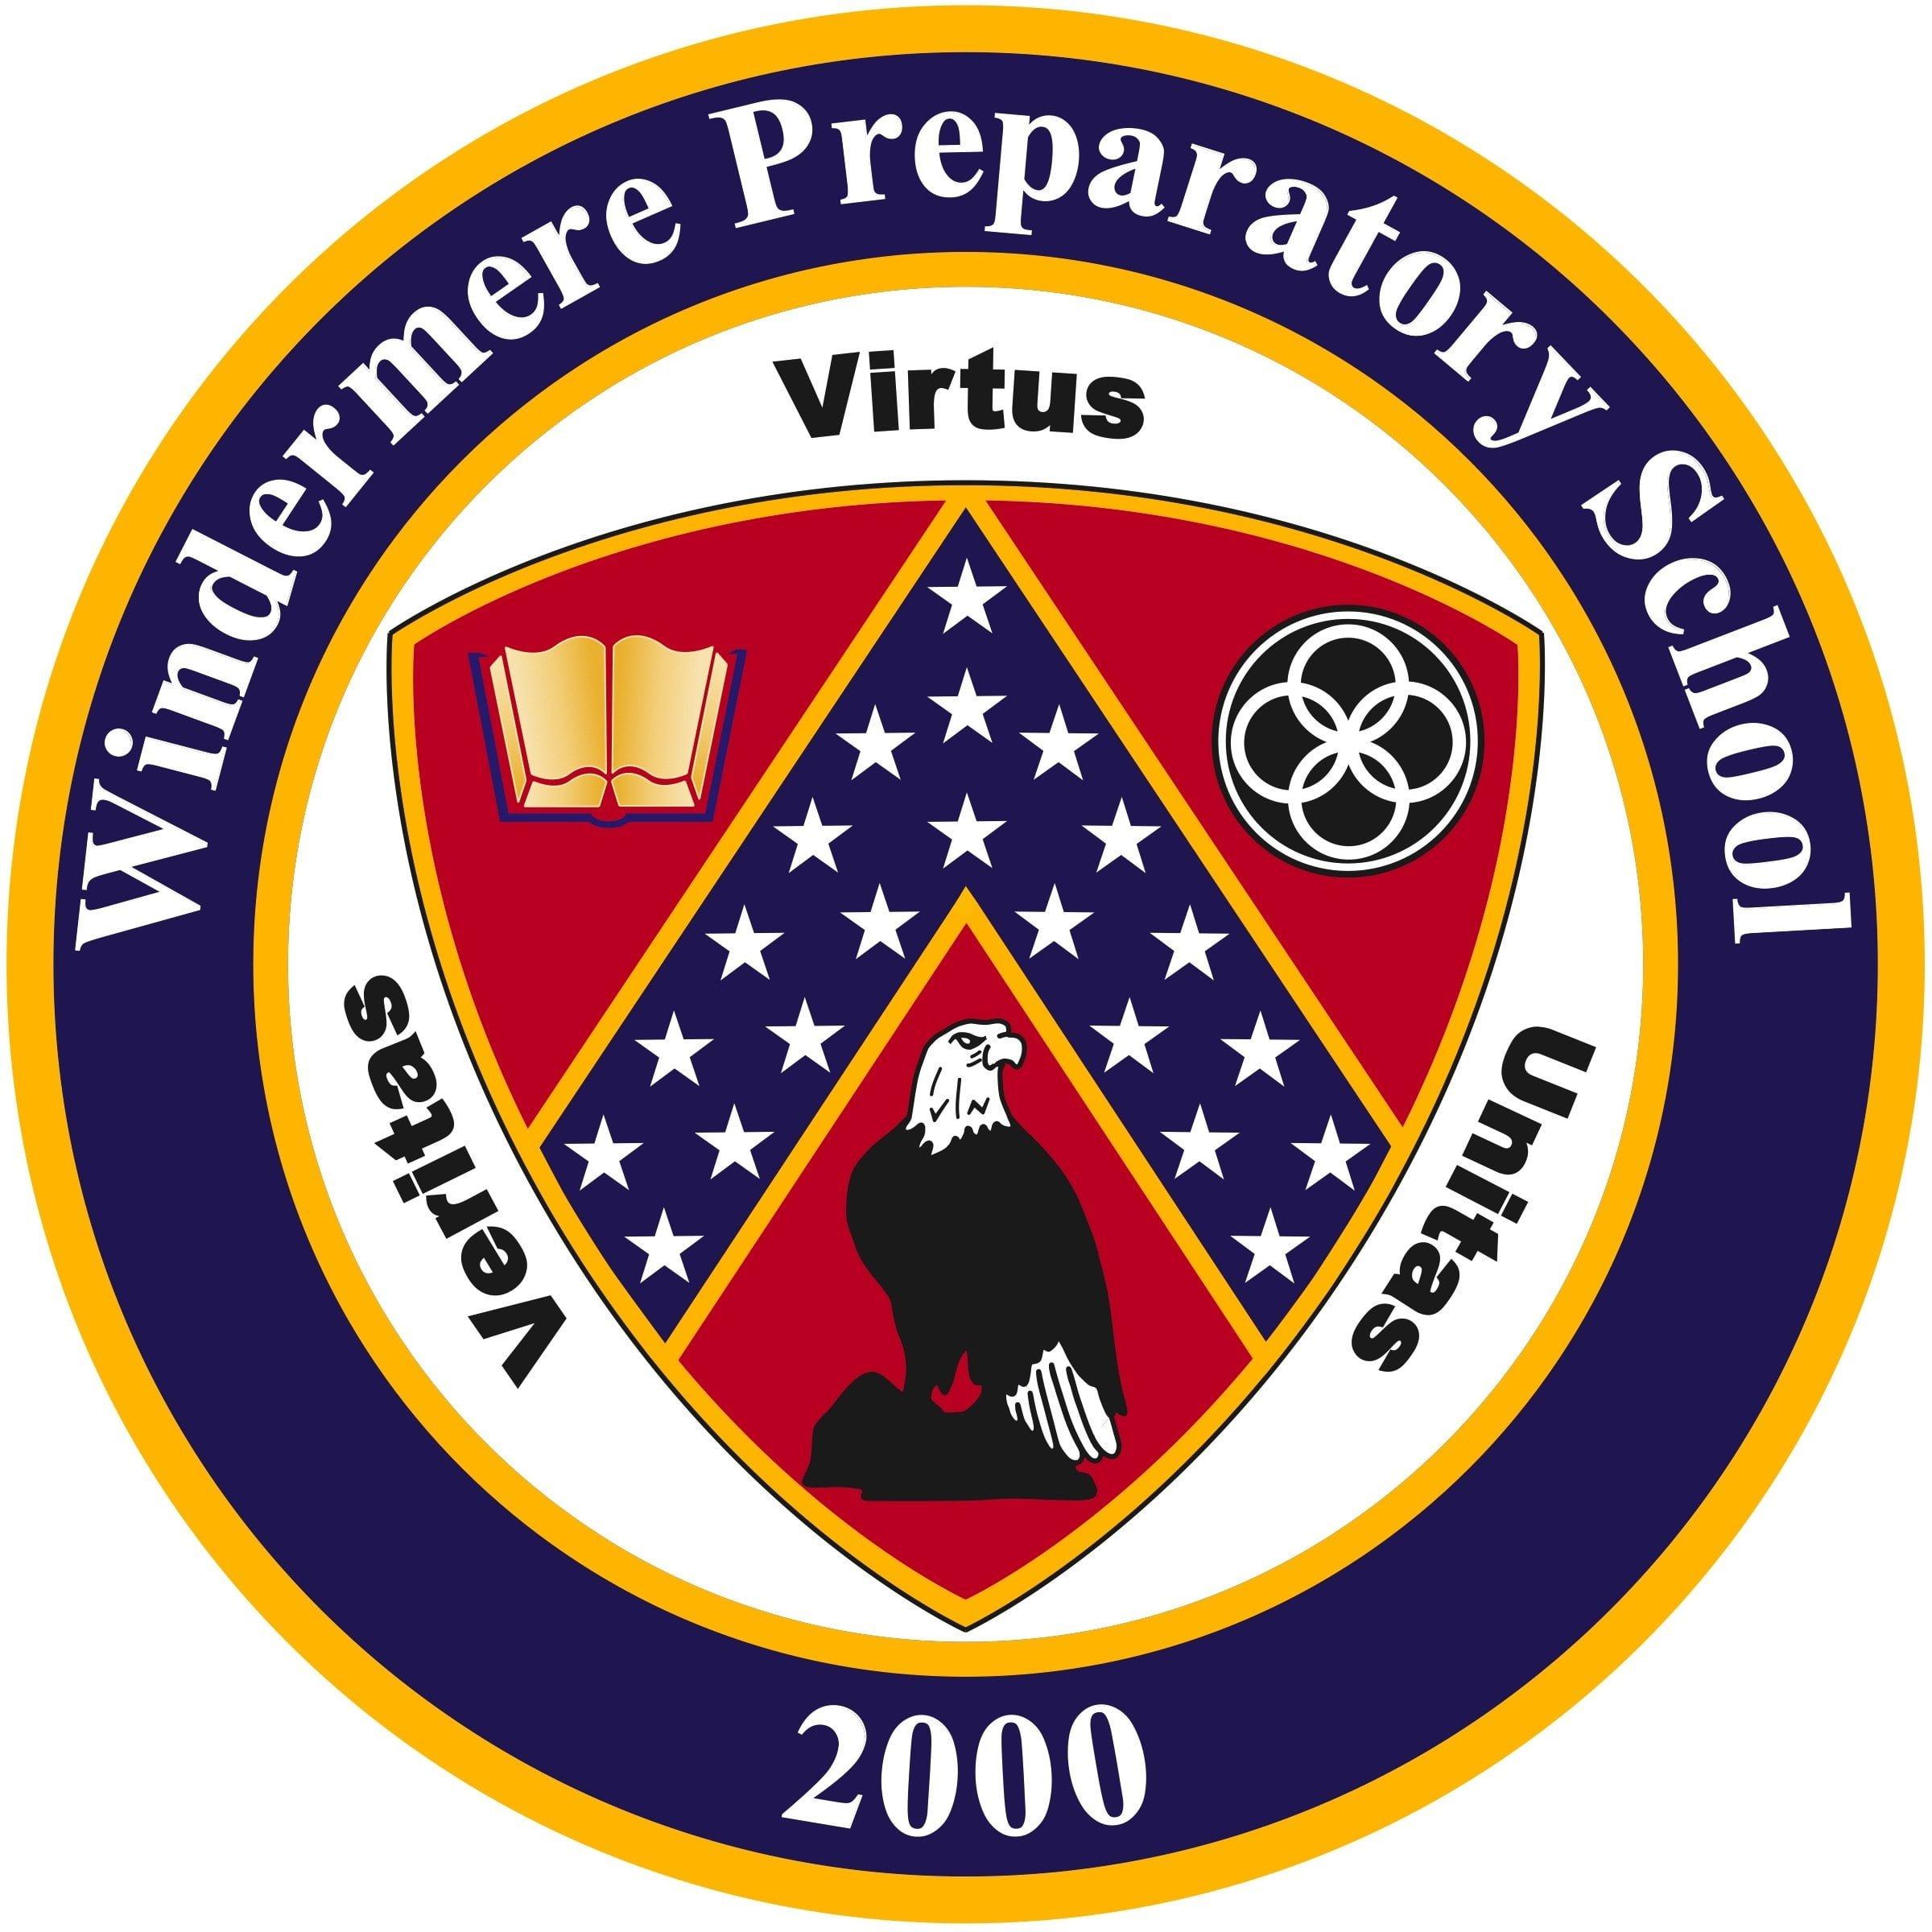 Windermere Prep Logo